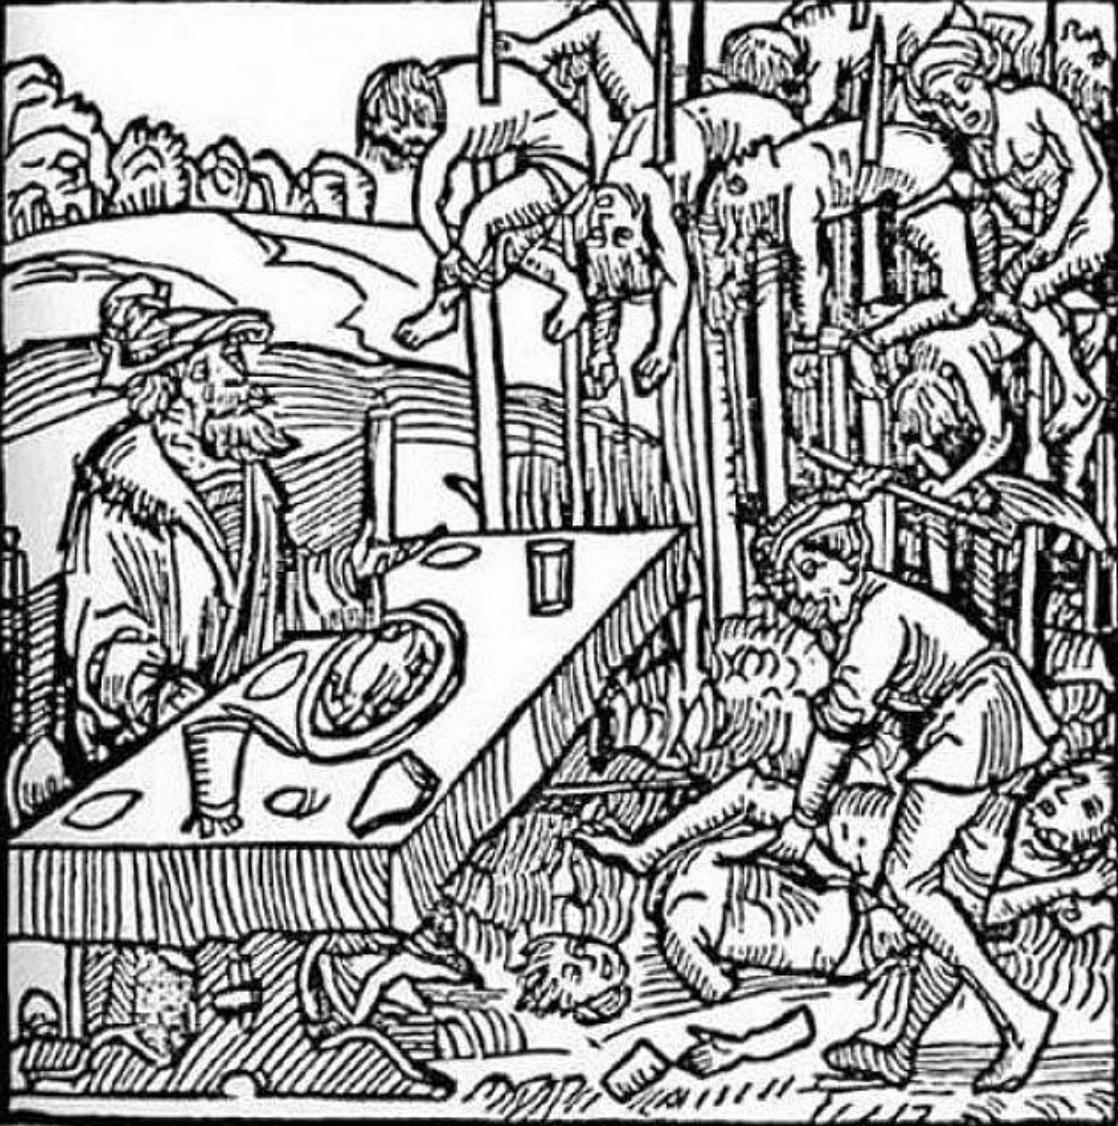 A woodcut print of Vlad amongst his impaled. http://www.aeolus13umbra.com/2013/10/vlad-dracula-dragons-shadow-balkan.html